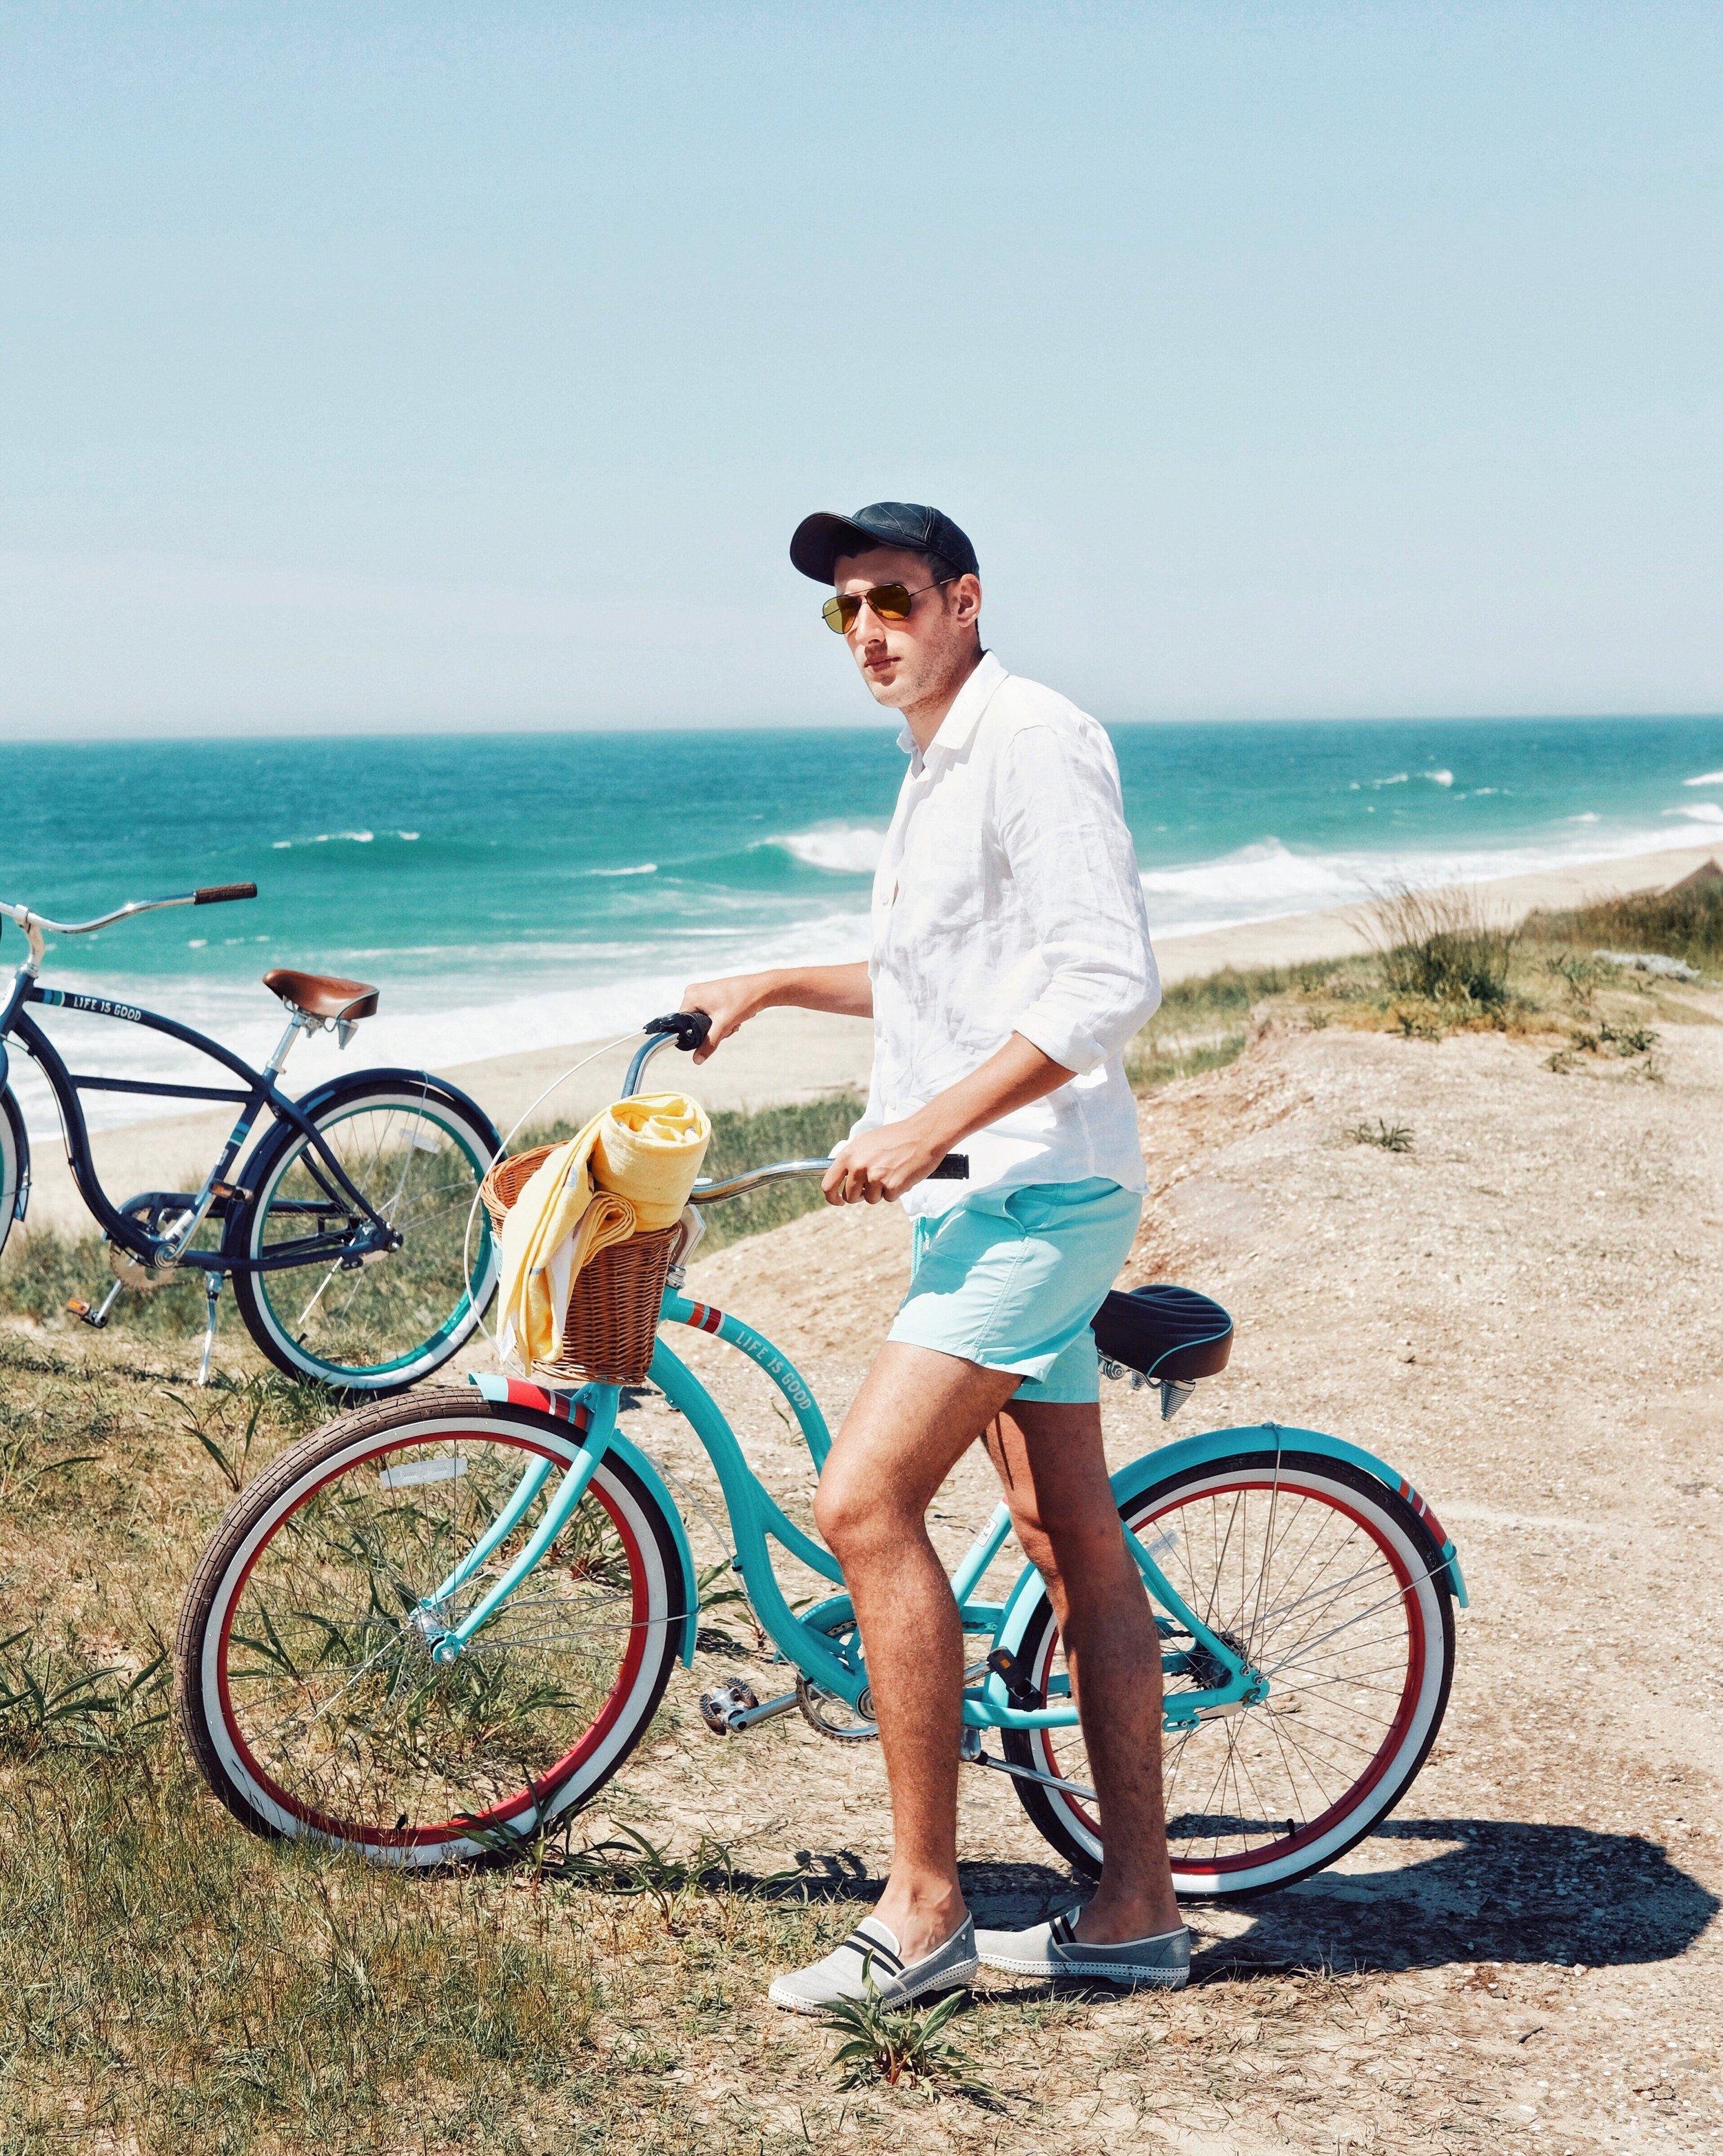 Biking to the beach - Wearing all Vilebrequin